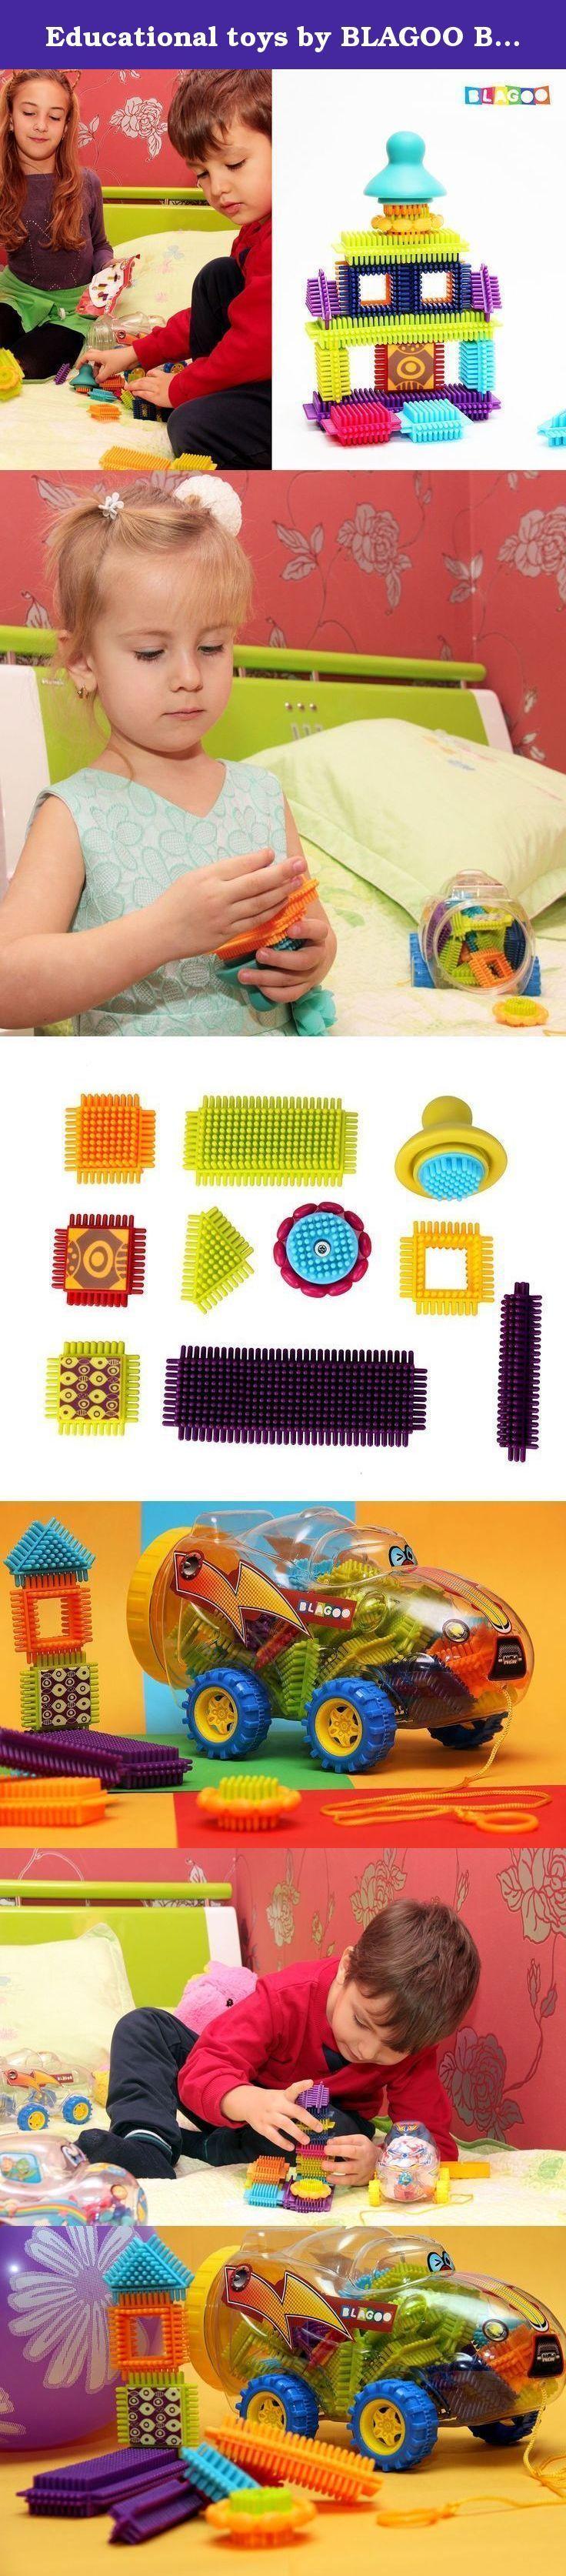 Educational toys by BLAGOO Building Blocks for Boys & Girls 3 4